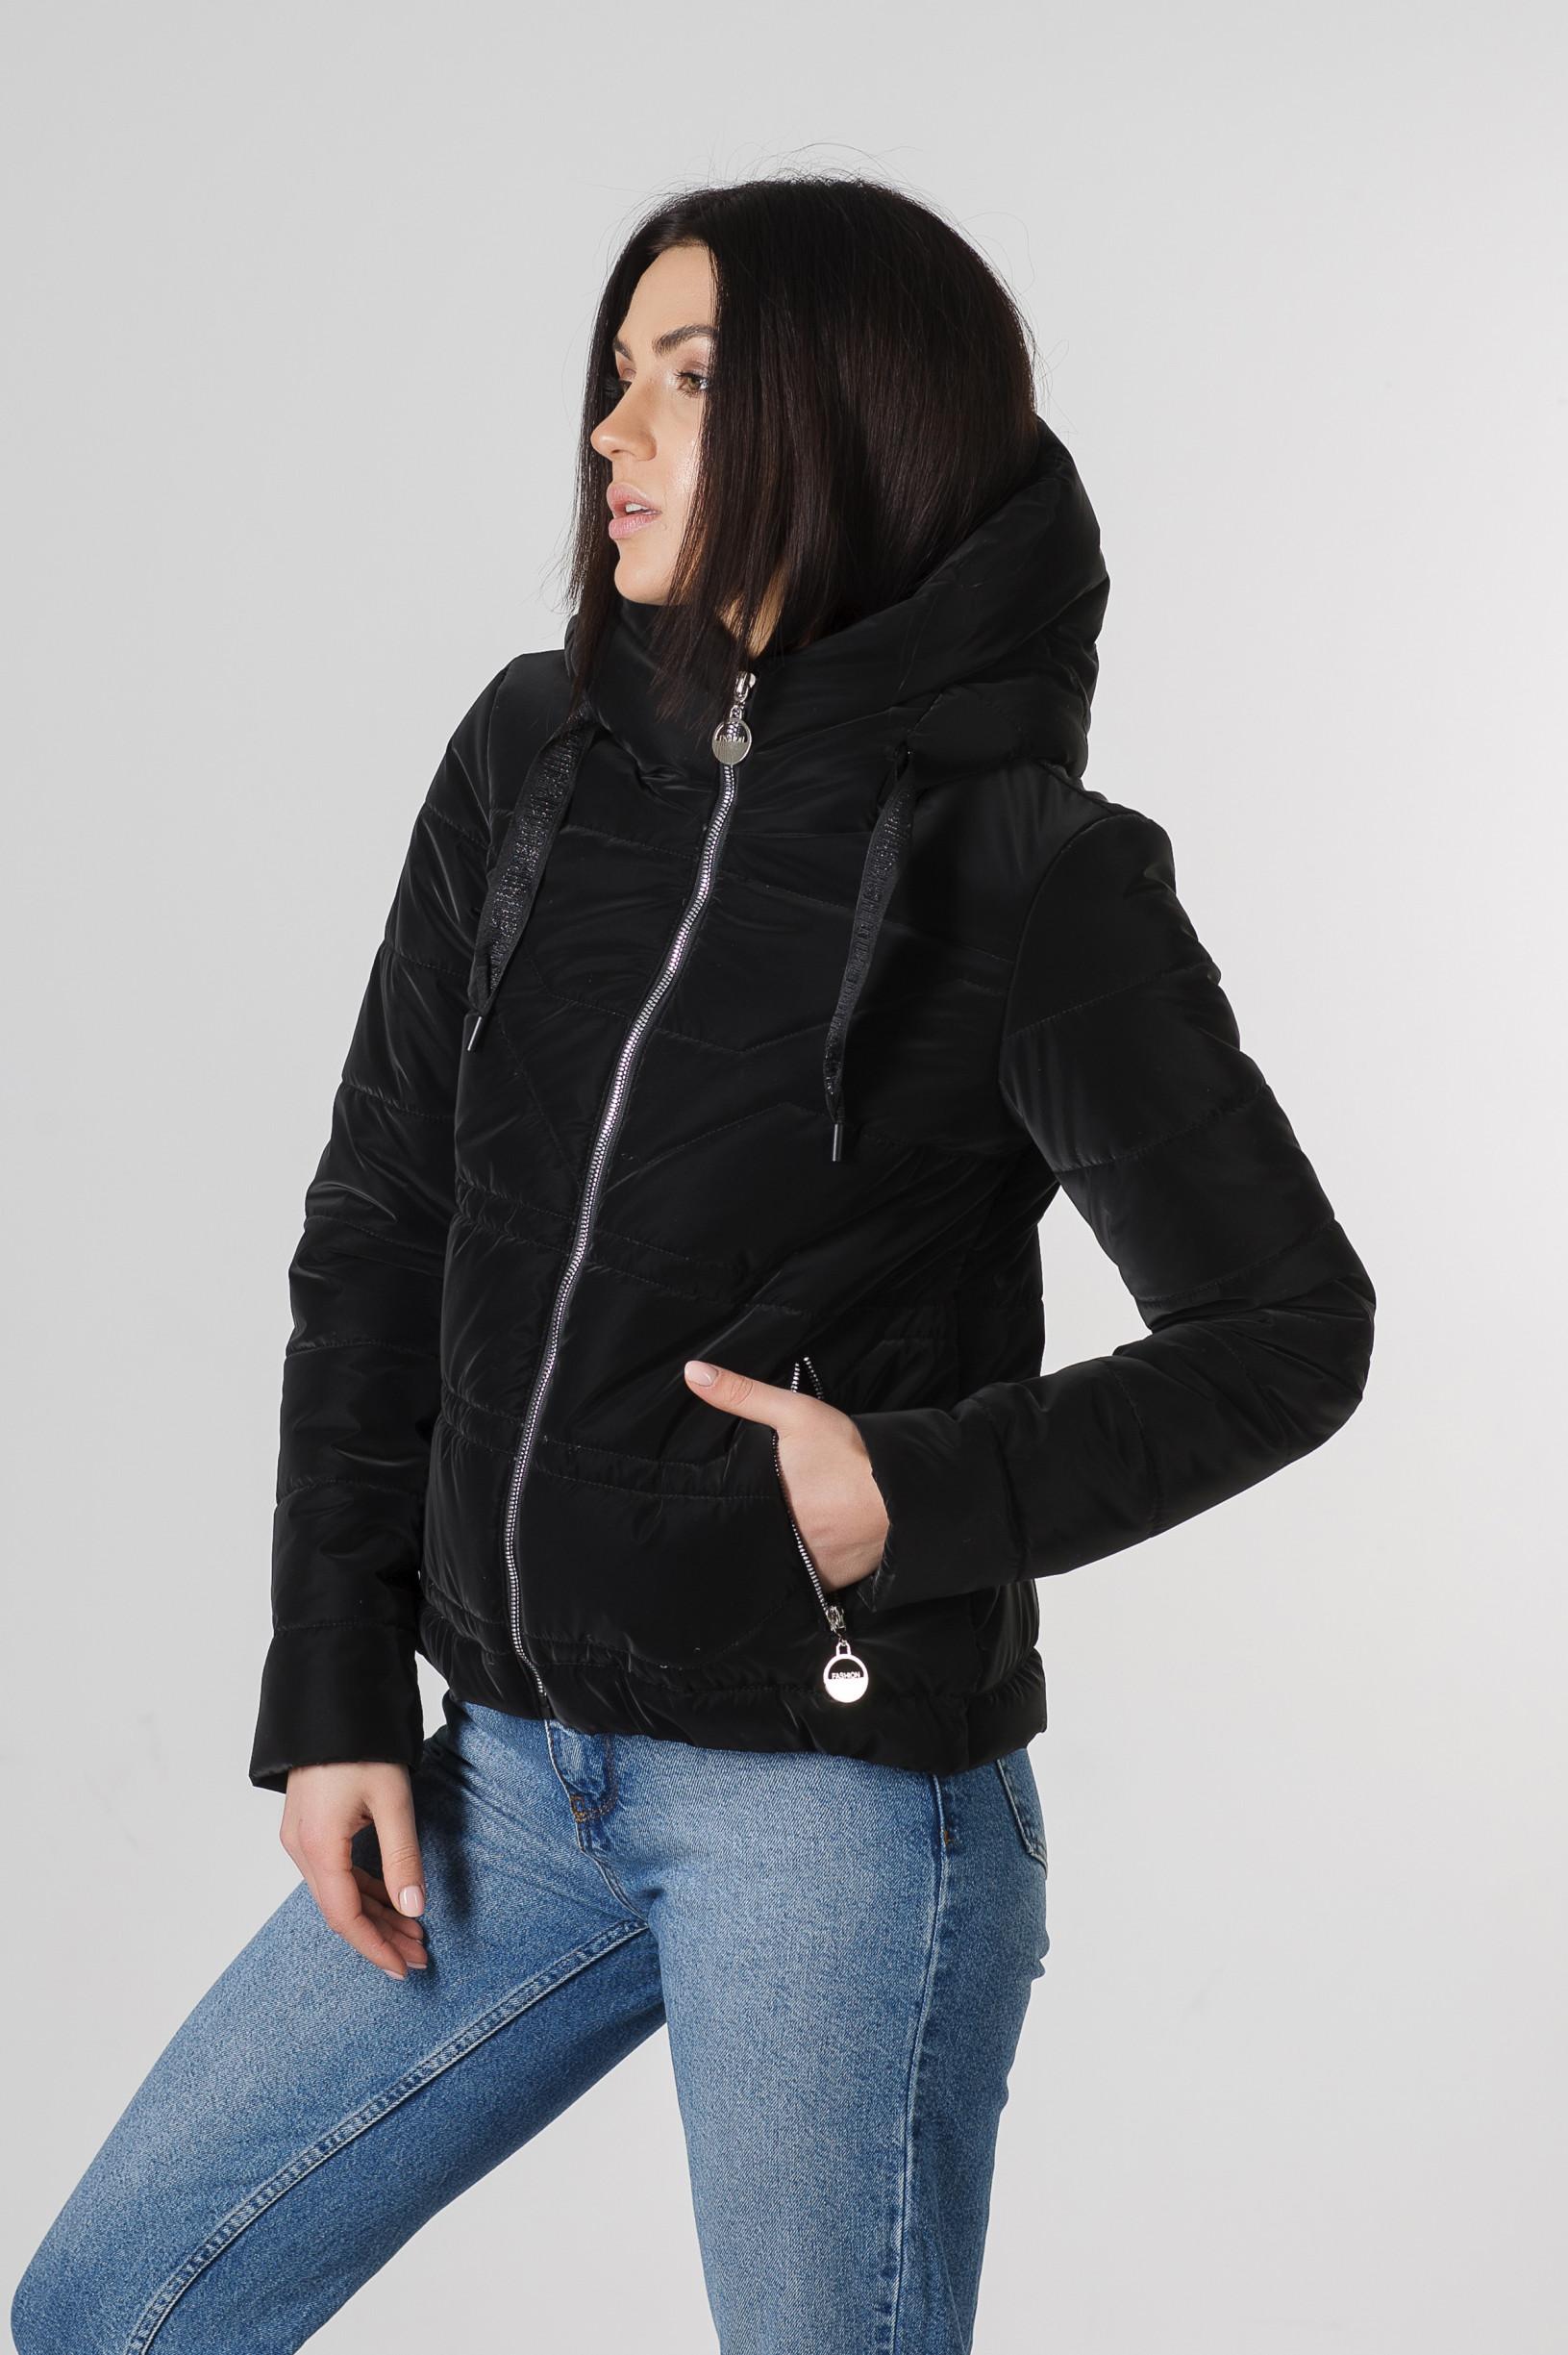 Весення укороченная чёрная куртка Лия бархат